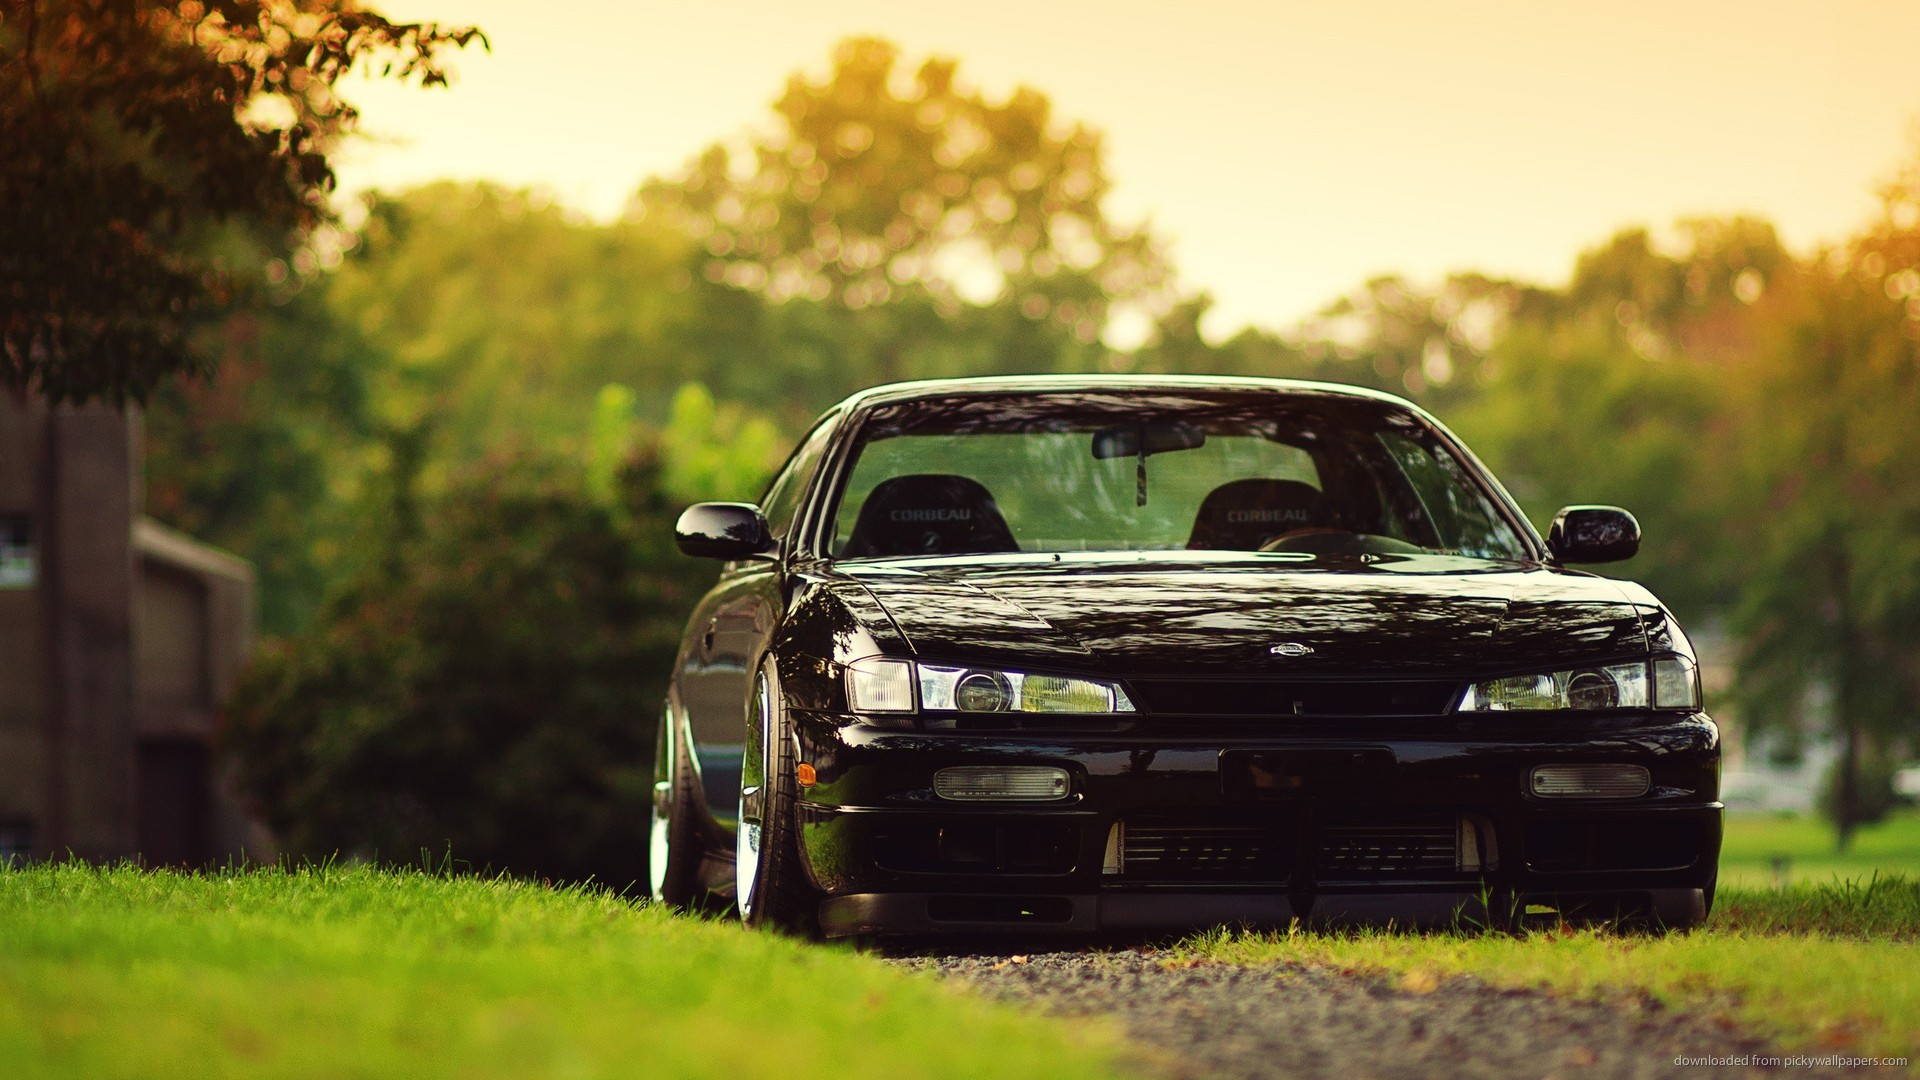 Nissan Silvia S15 Wallpaper 1485479 Hd Wallpaper Backgrounds Download